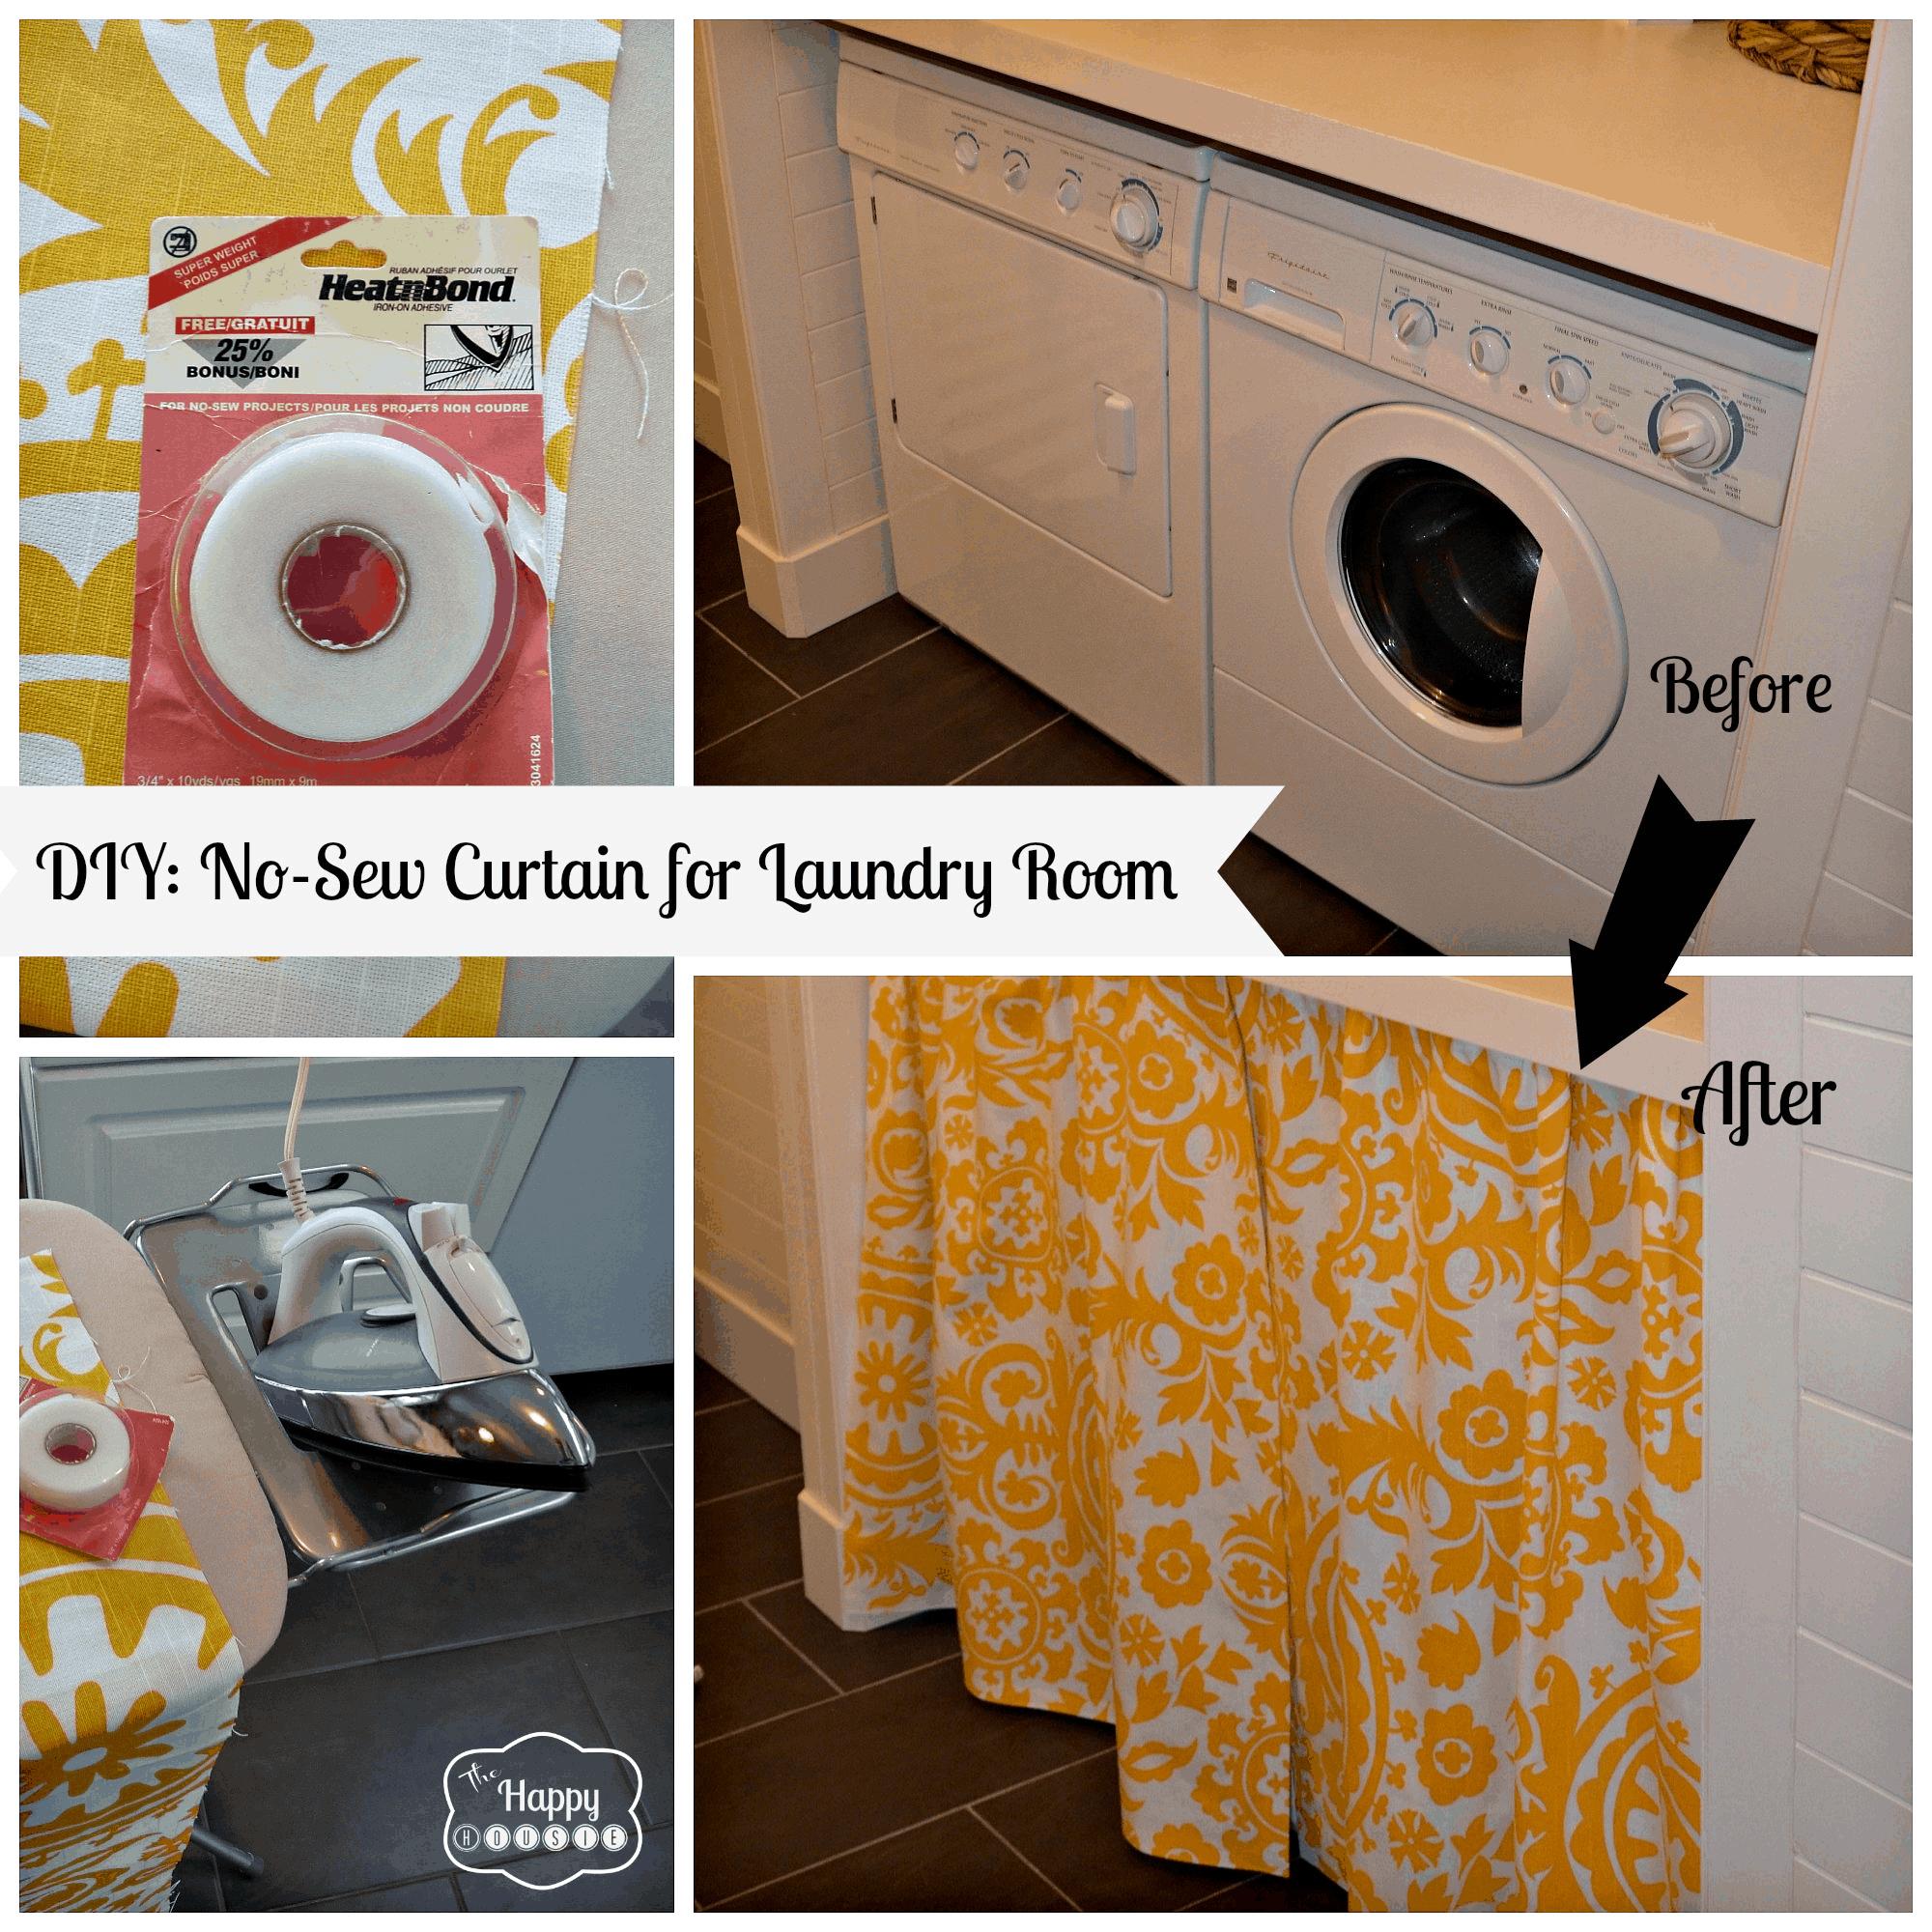 No-sew laundry room curtain